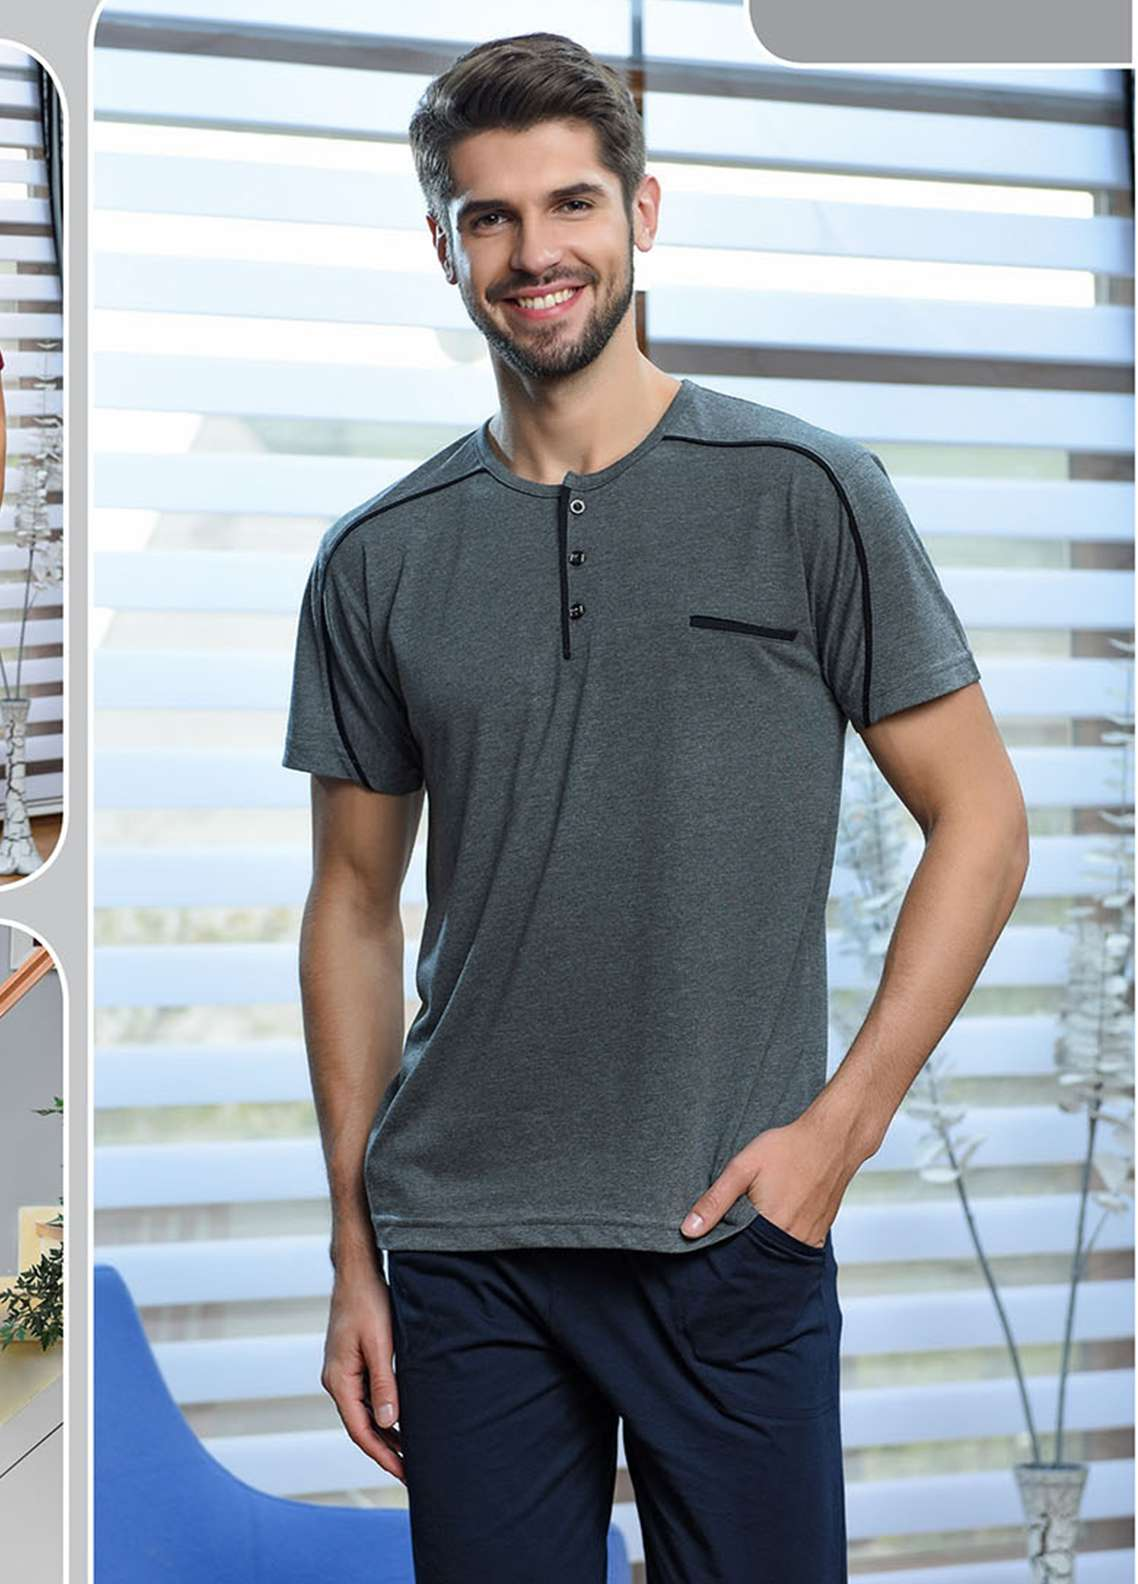 Cotton Net Nightwear for Men 2 Piece NS18M 0816 GREY